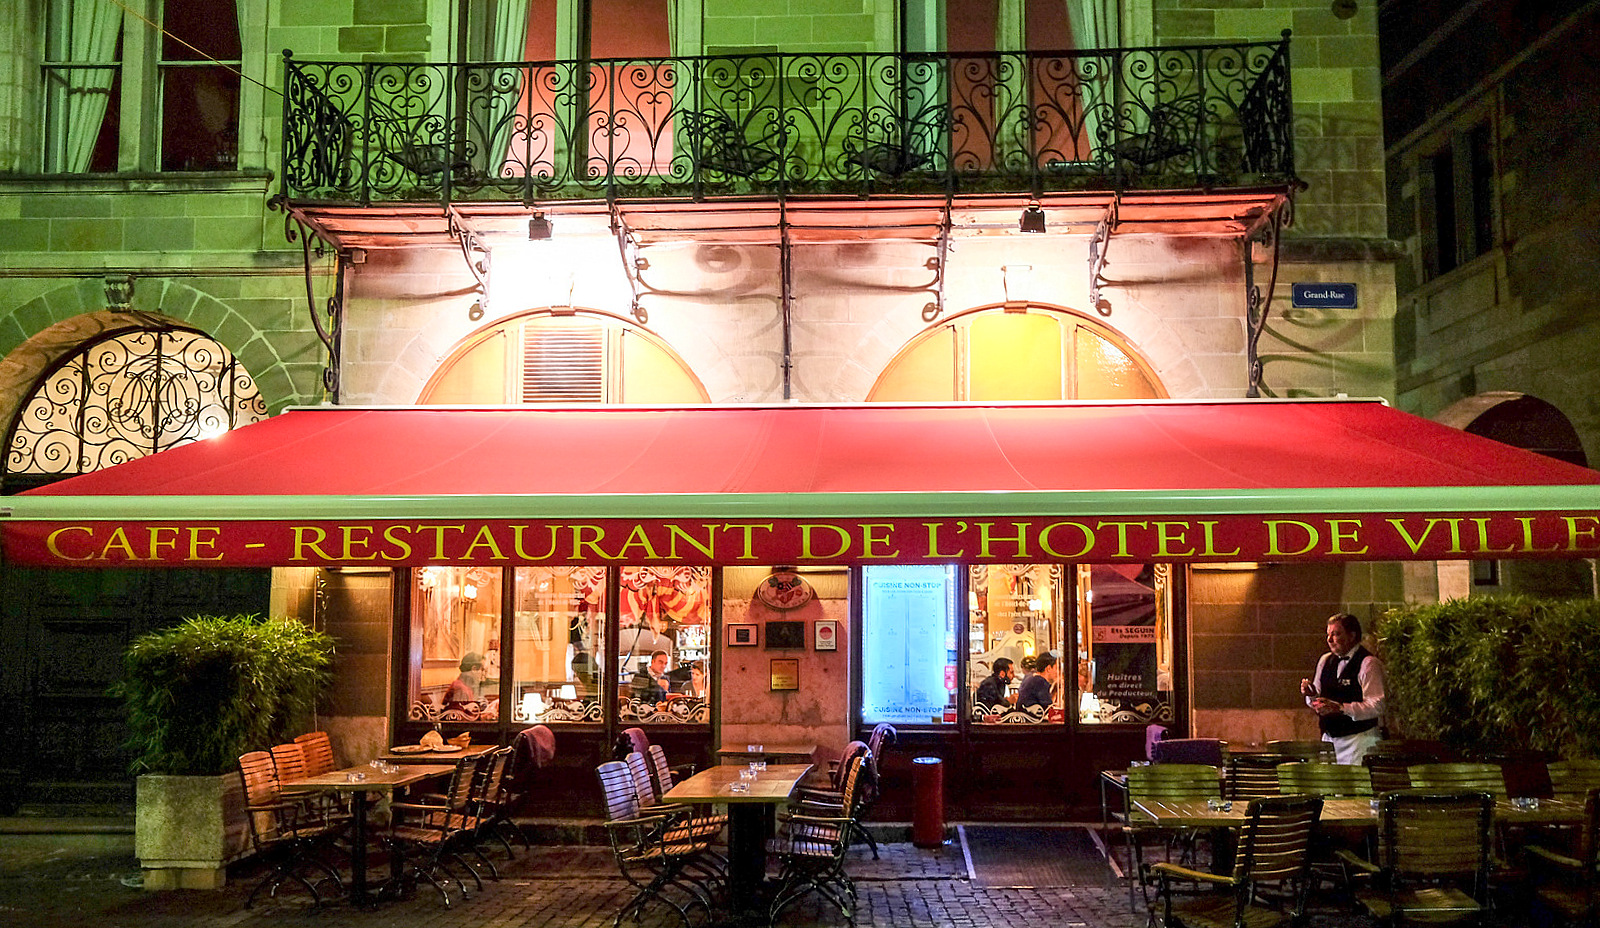 Restaurant de l'Hotel de Ville, Geneva